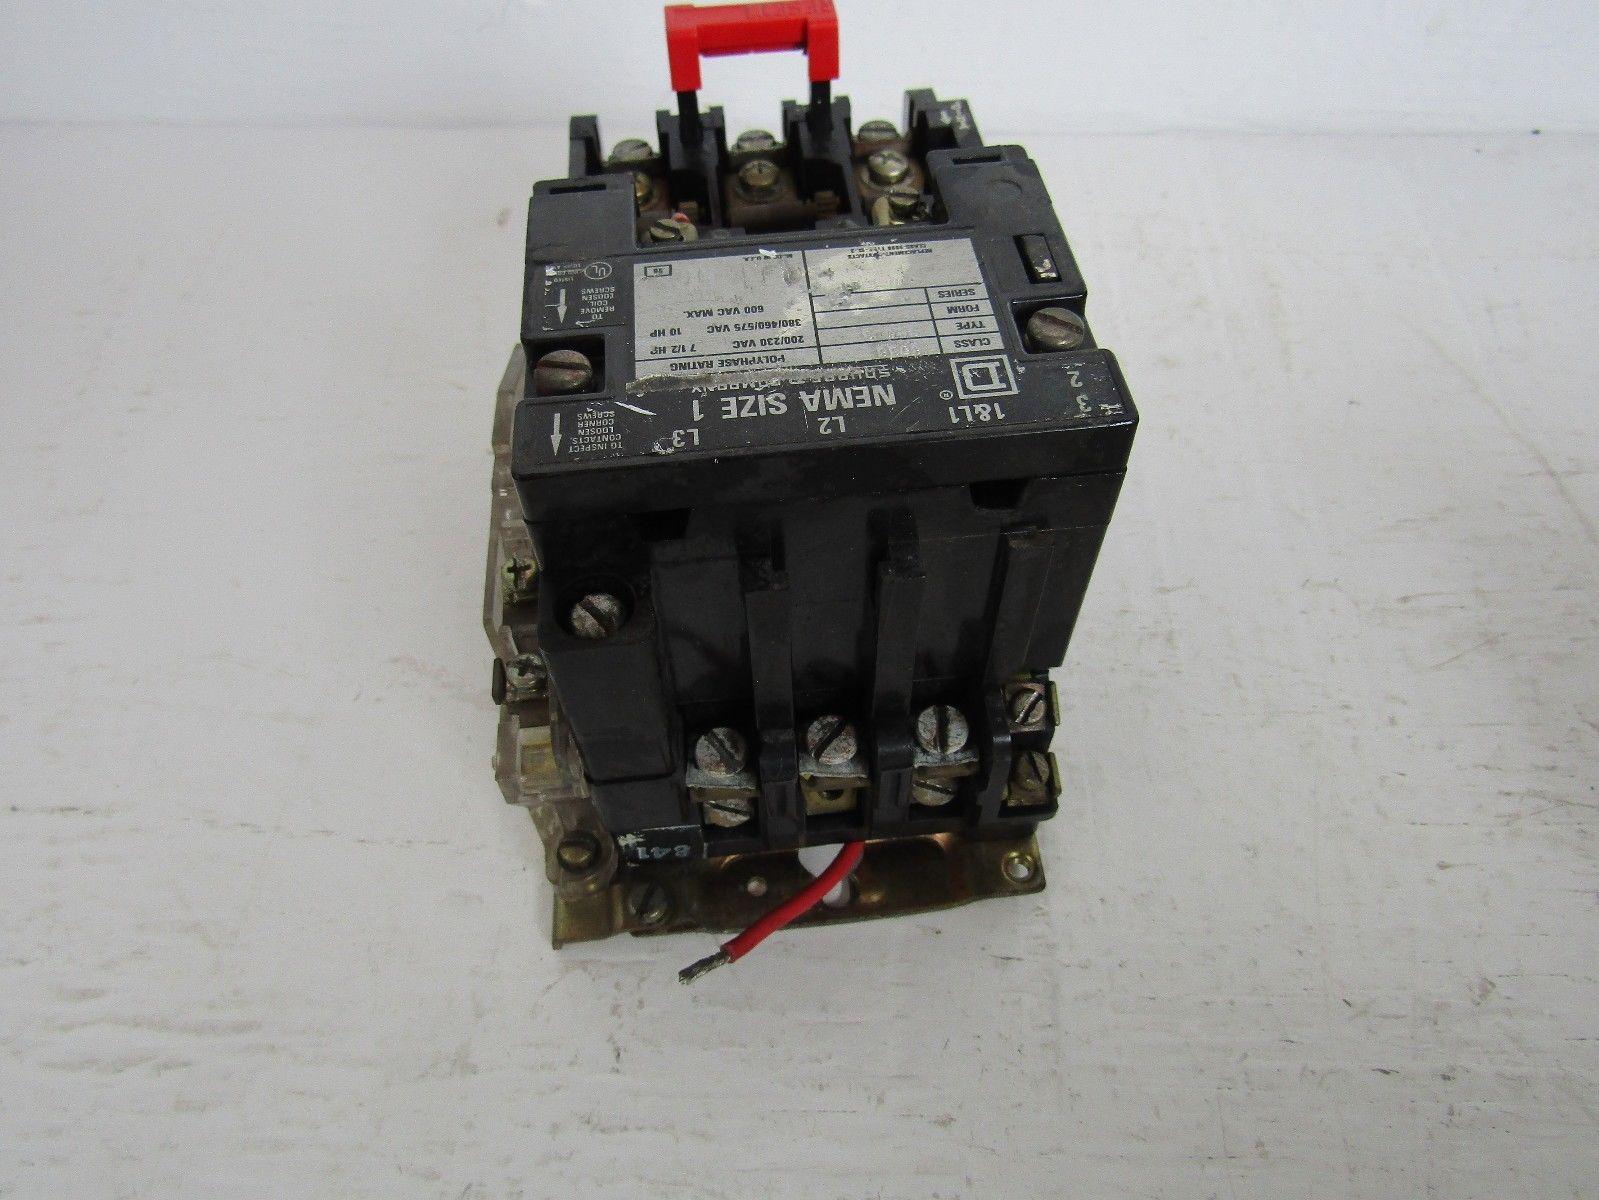 Square D L211n Wiring Diagram Best 2017 Nema Size 1 Motor Starter Magnificent 8536sb02s Ideas